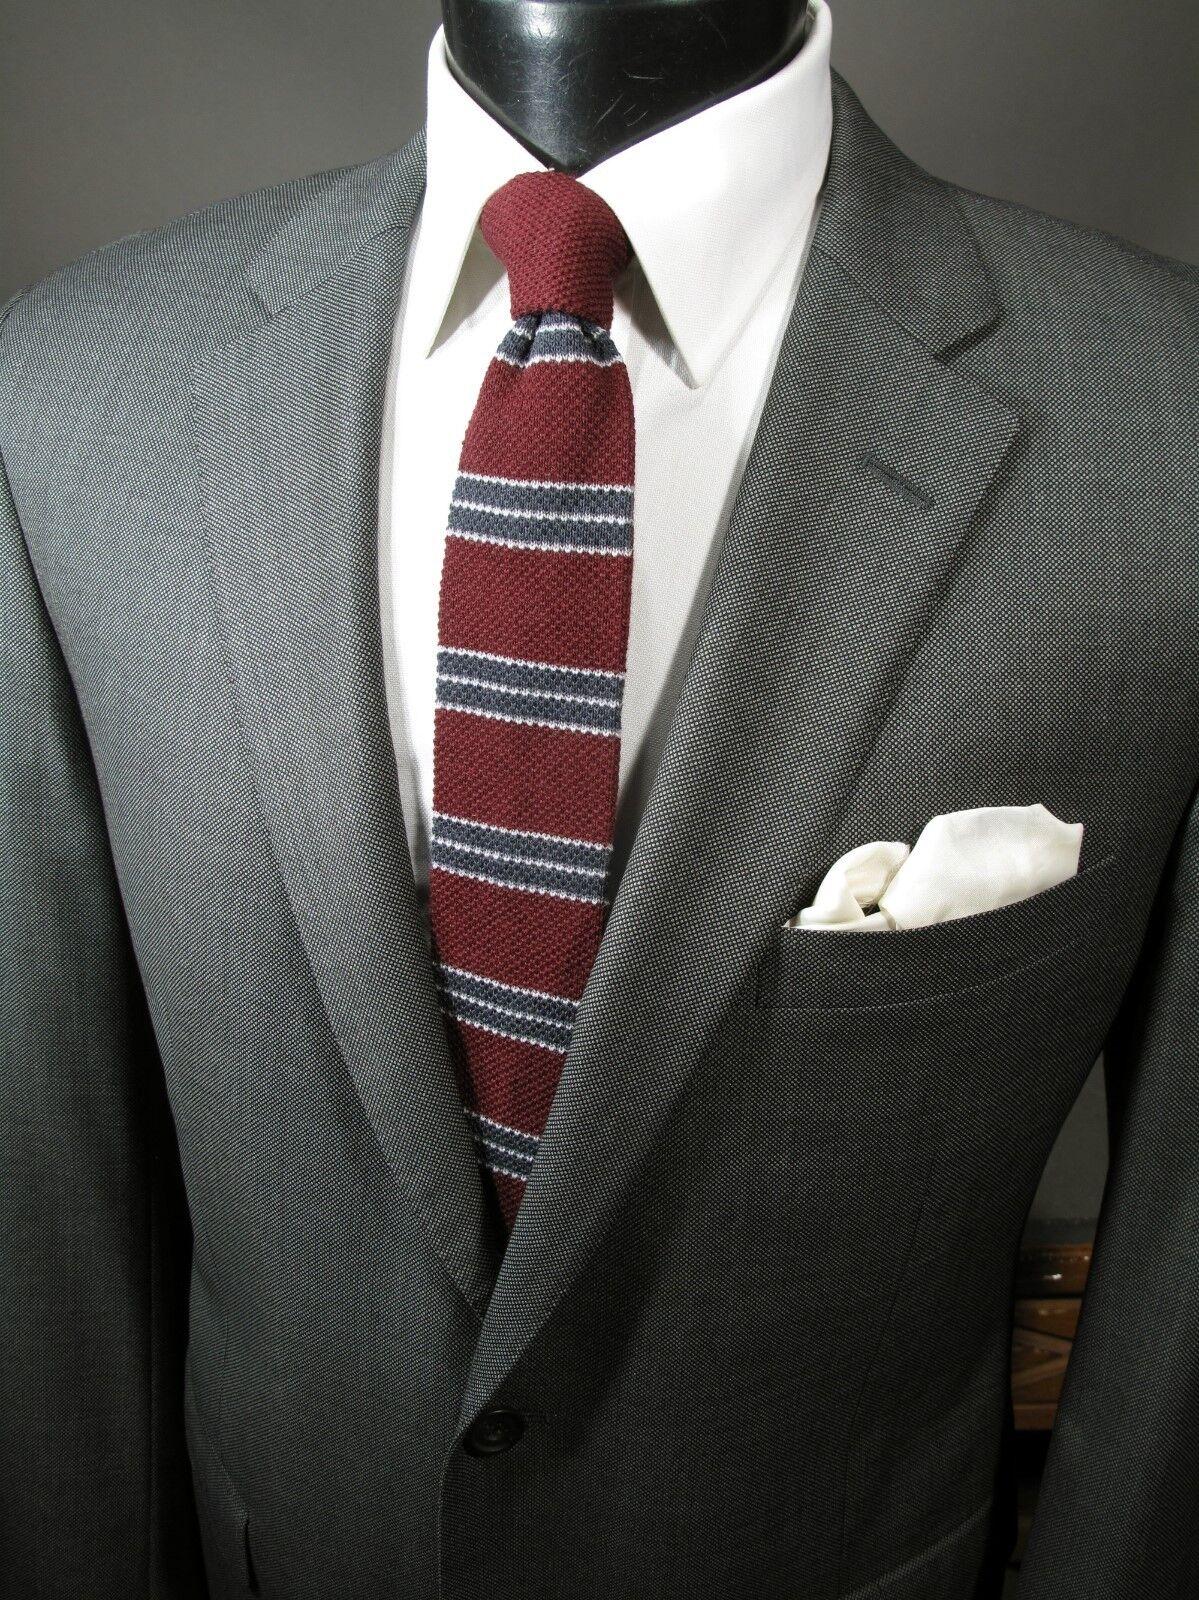 Samuelsohn Suit Blazer Sport Coat 44R grau Nailhead 2 Btn 150s Wool Medium Wgt